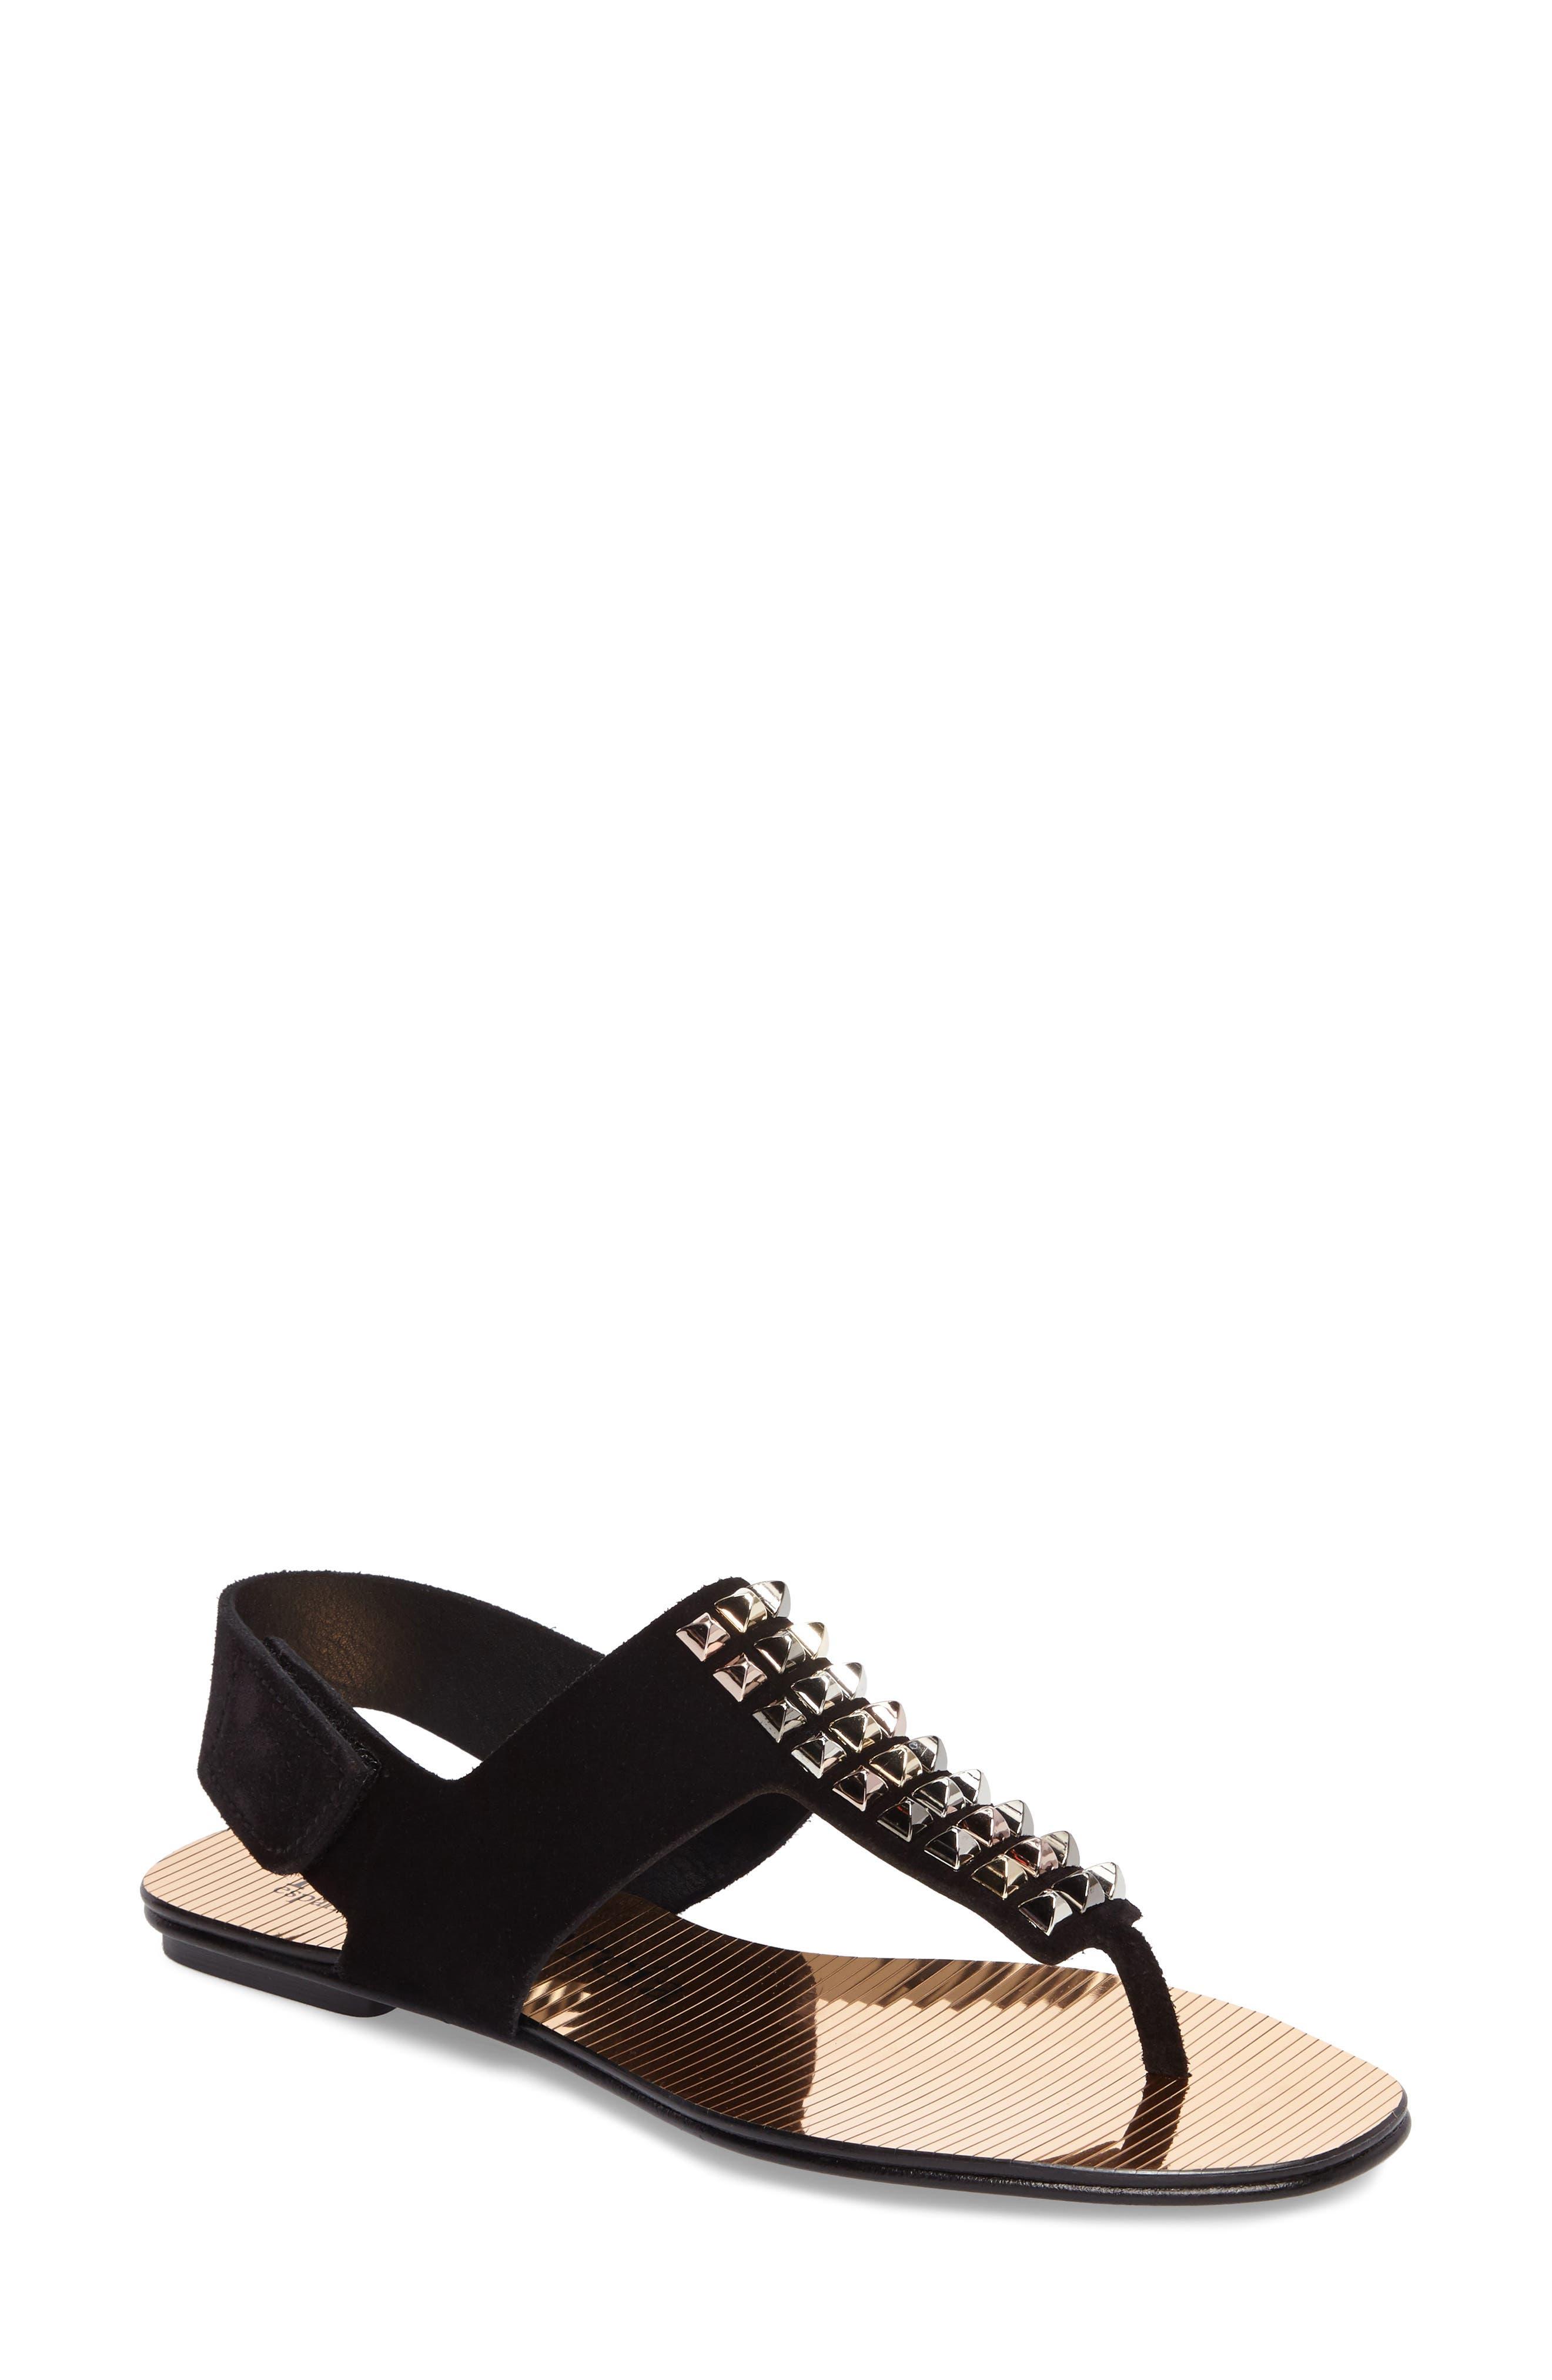 Enid Studded T-Strap Sandal,                         Main,                         color, 001